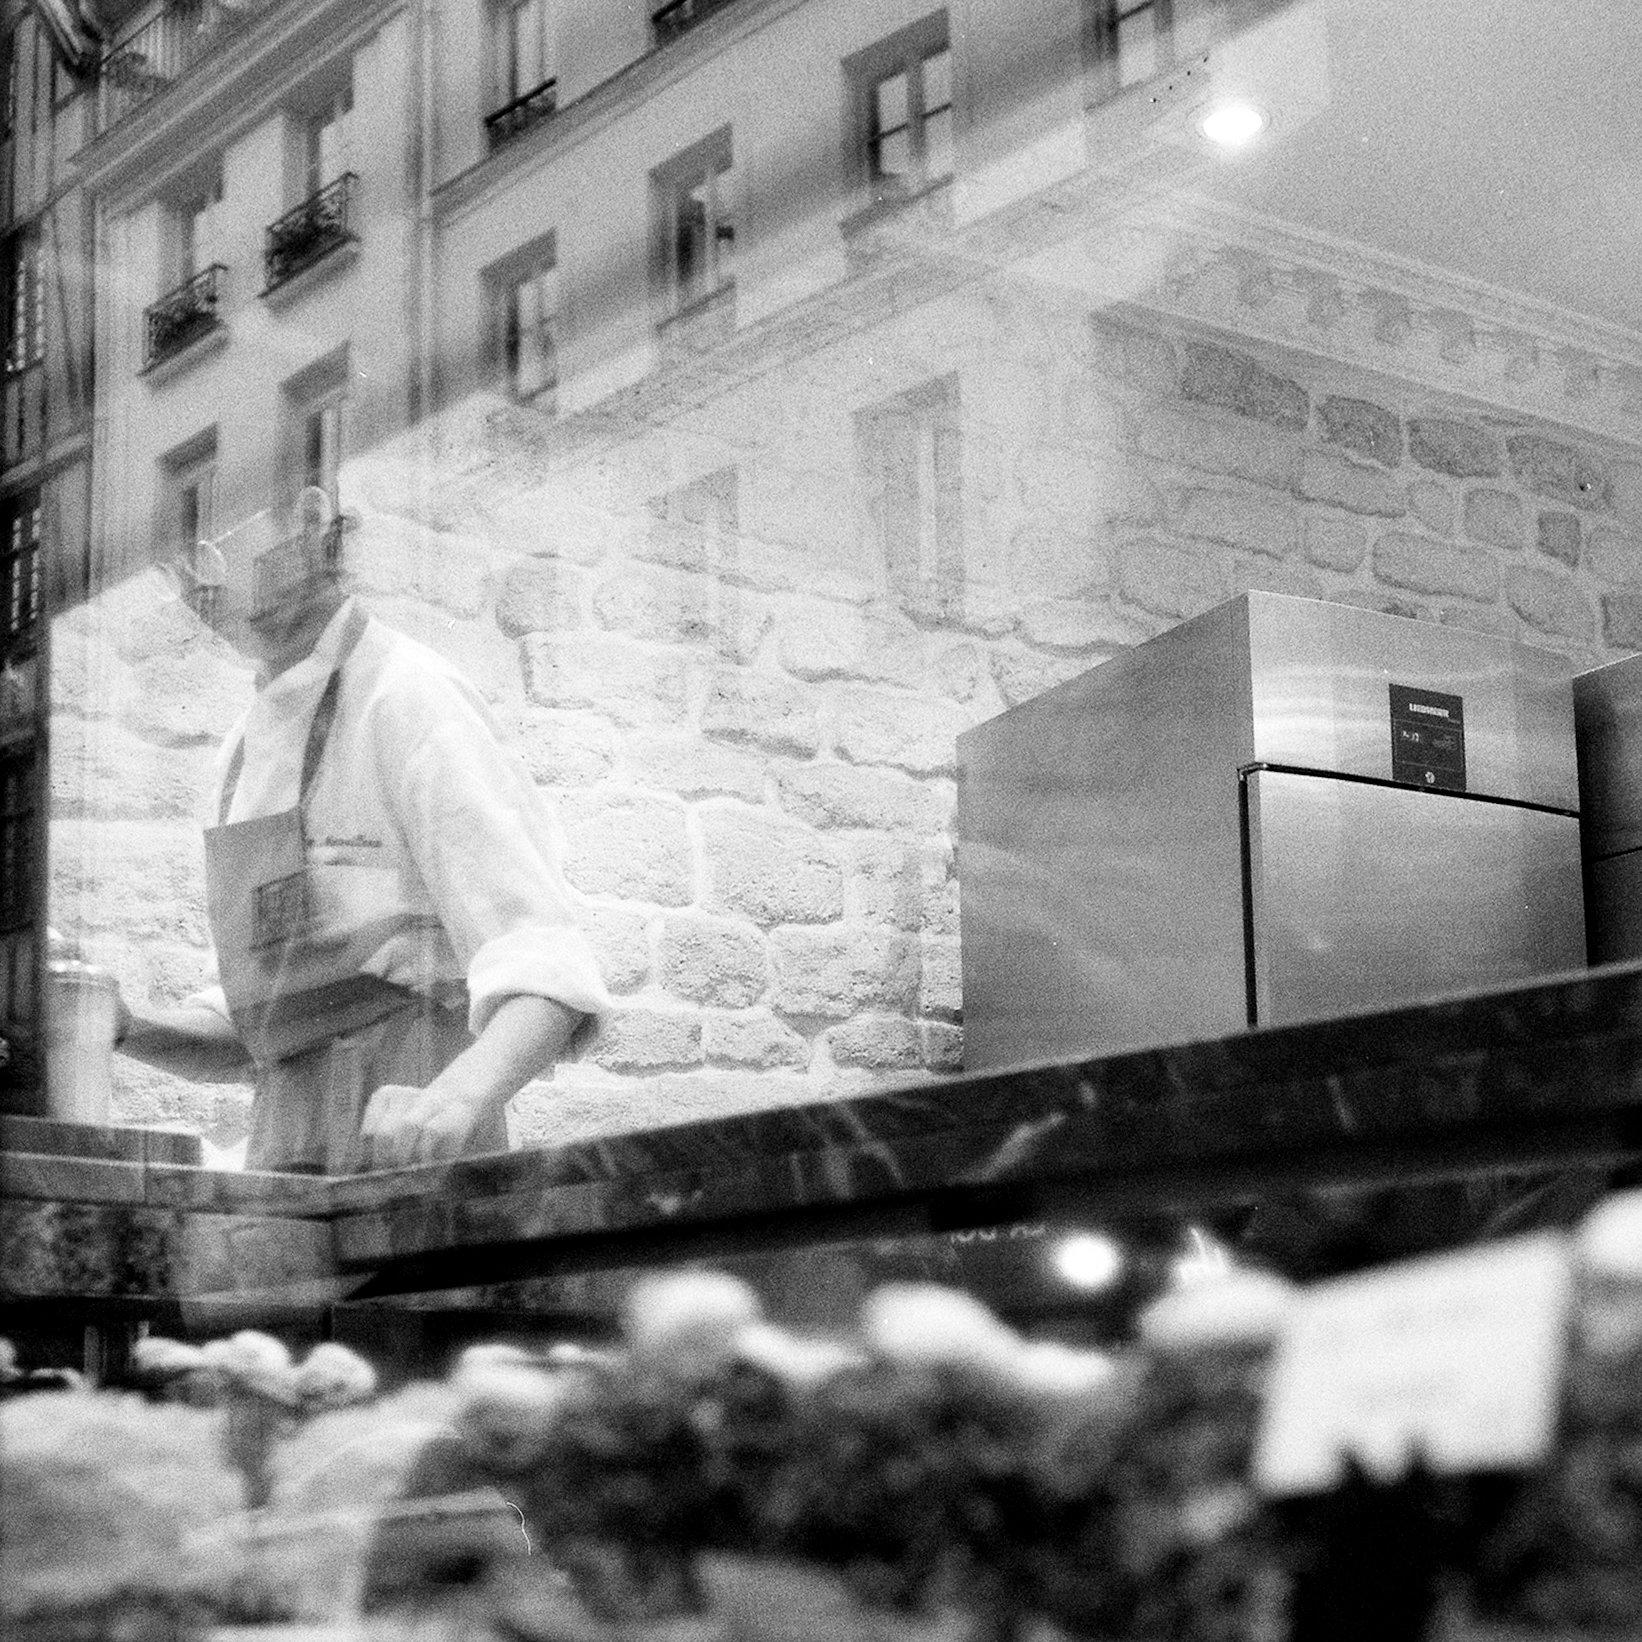 Paris Hasselblad B&W-0003.jpg